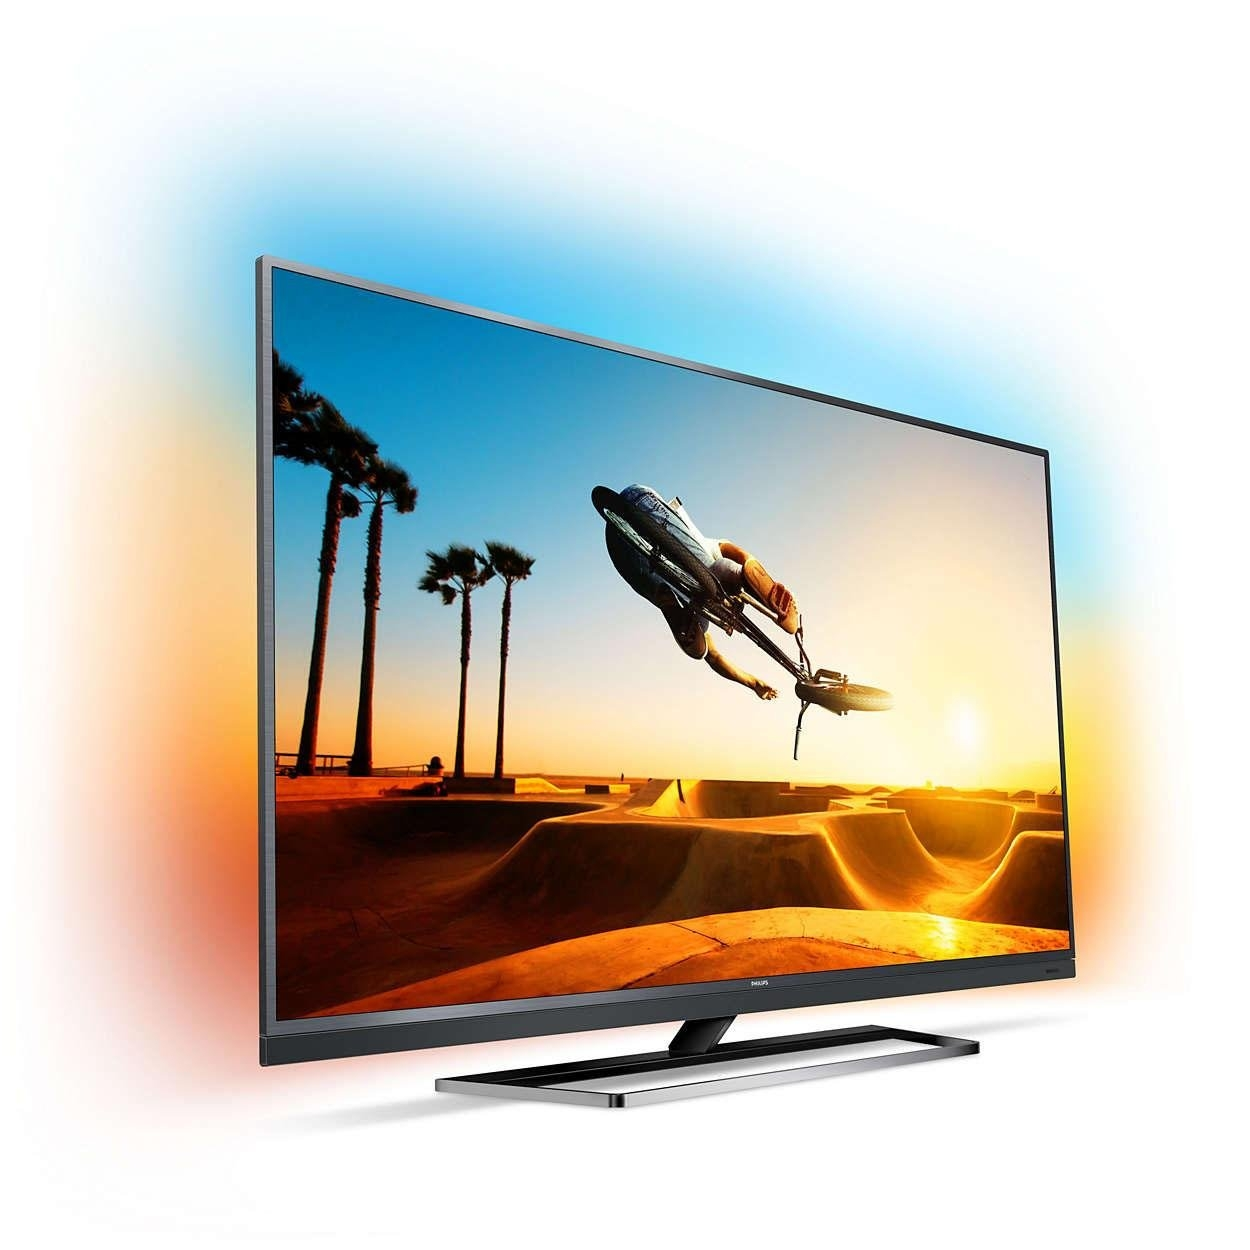 philips 49pus7502 12 led tv 123 cm 49 inch 4k ultra hd smart tv online shoppen otto. Black Bedroom Furniture Sets. Home Design Ideas